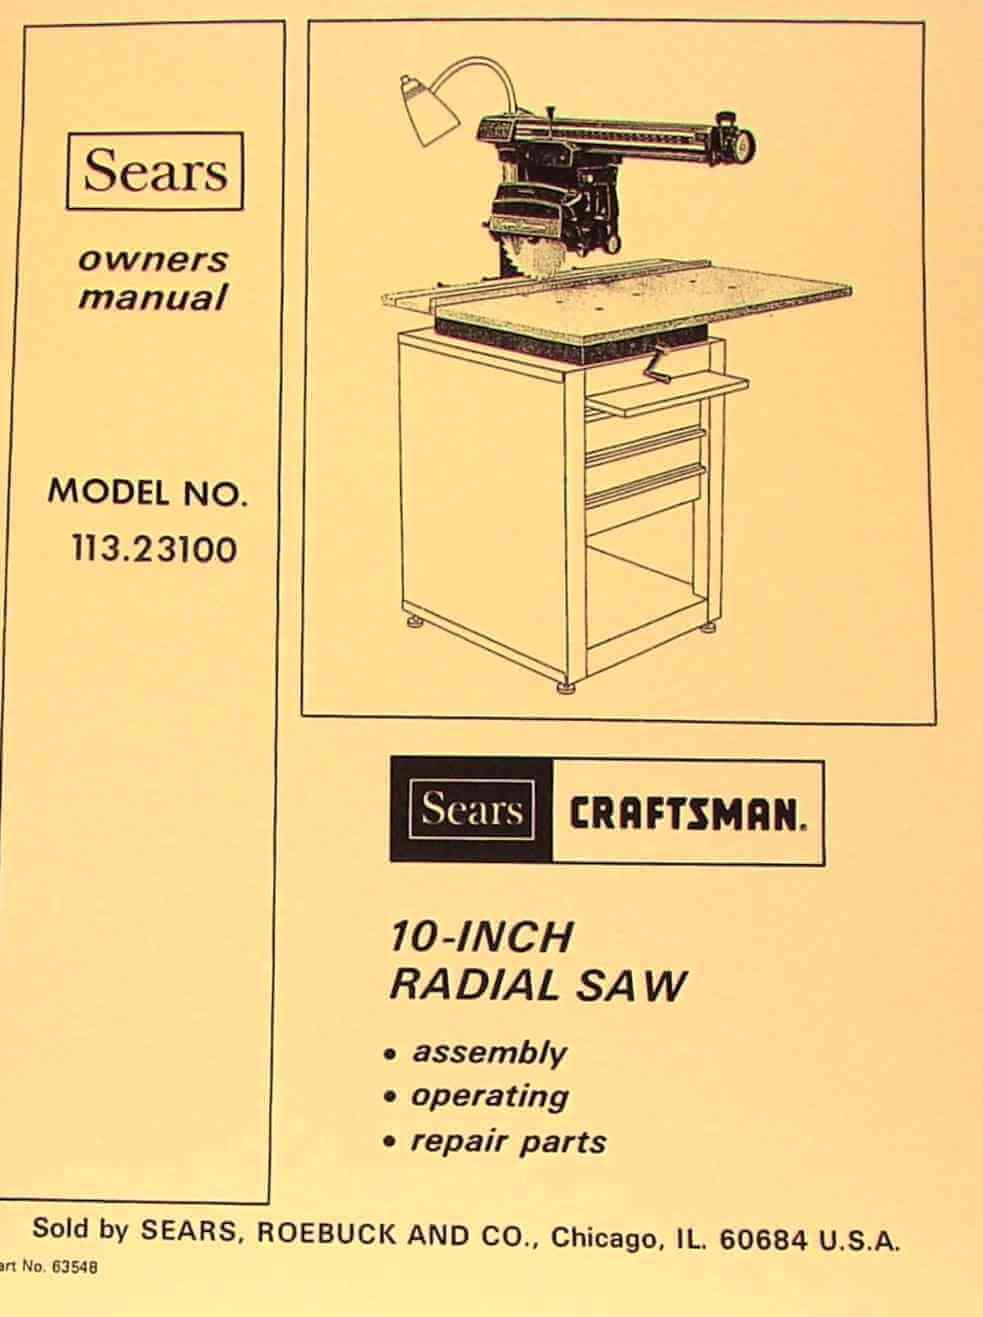 old craftsman radial arm saw manuals - FREE ONLINE